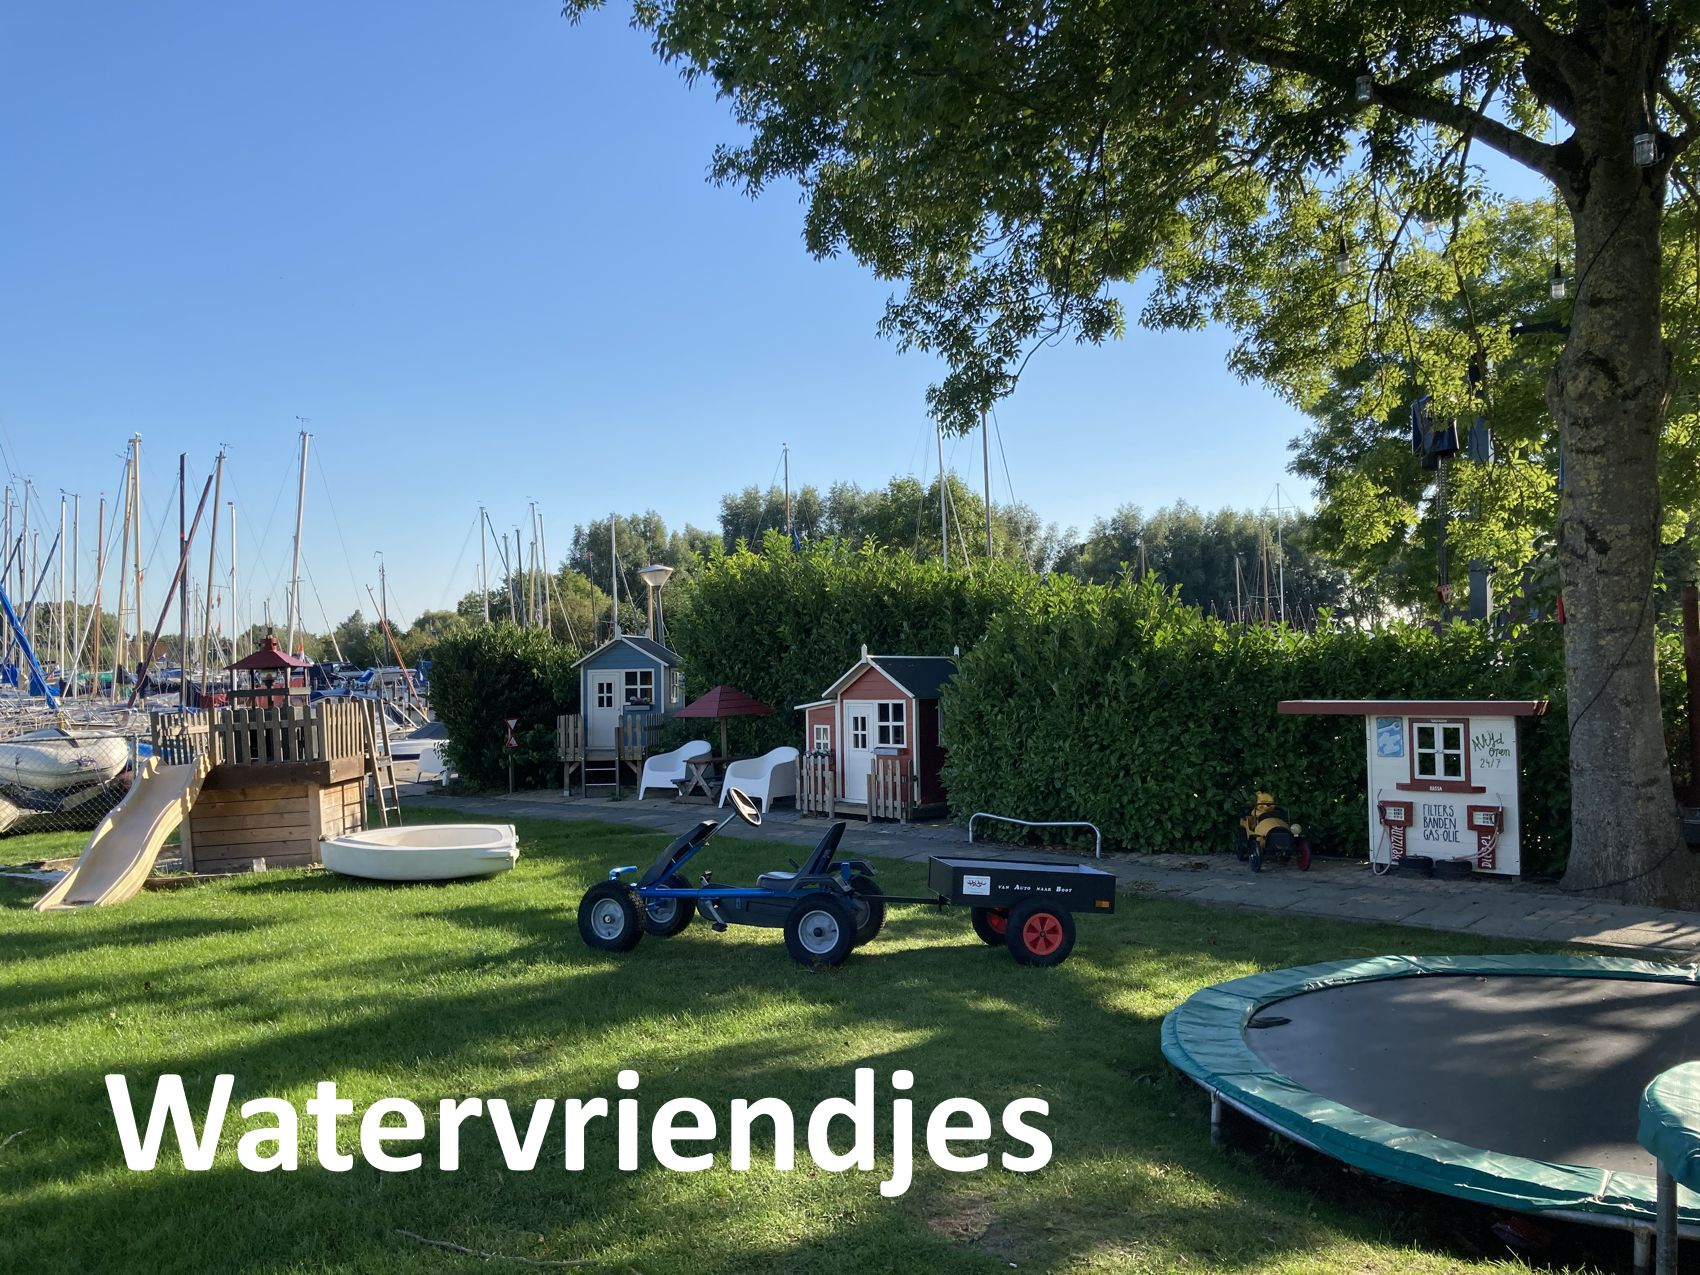 Watervriendjes_Speeltuin_Kinderen_Activiteiten_Jachthaven_de_Watervriend_Friesland